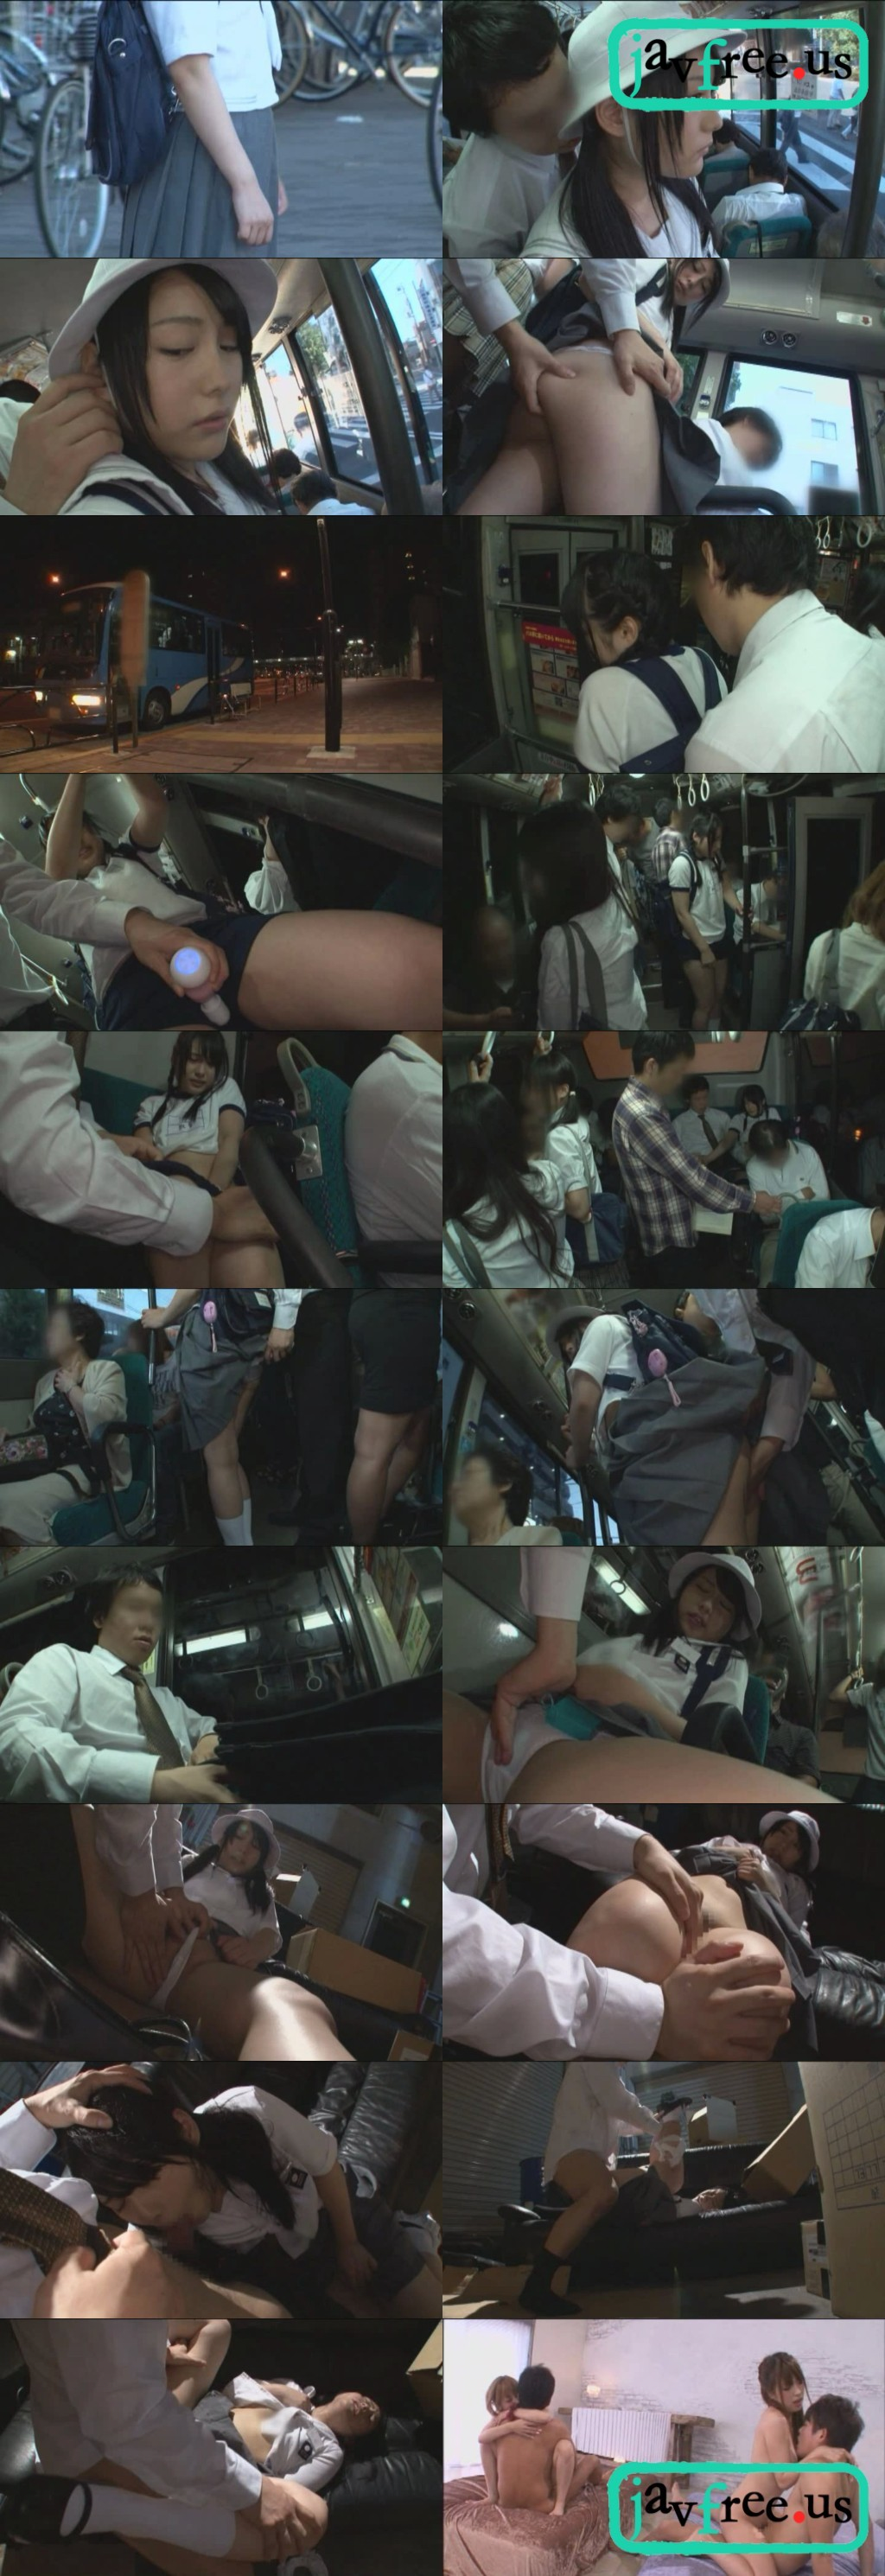 [SDMT-599] 路線バスで見つけたひと際●い●●一貫女子校生を足が震える程に、何度もイカせる - image SDMT599 on https://javfree.me